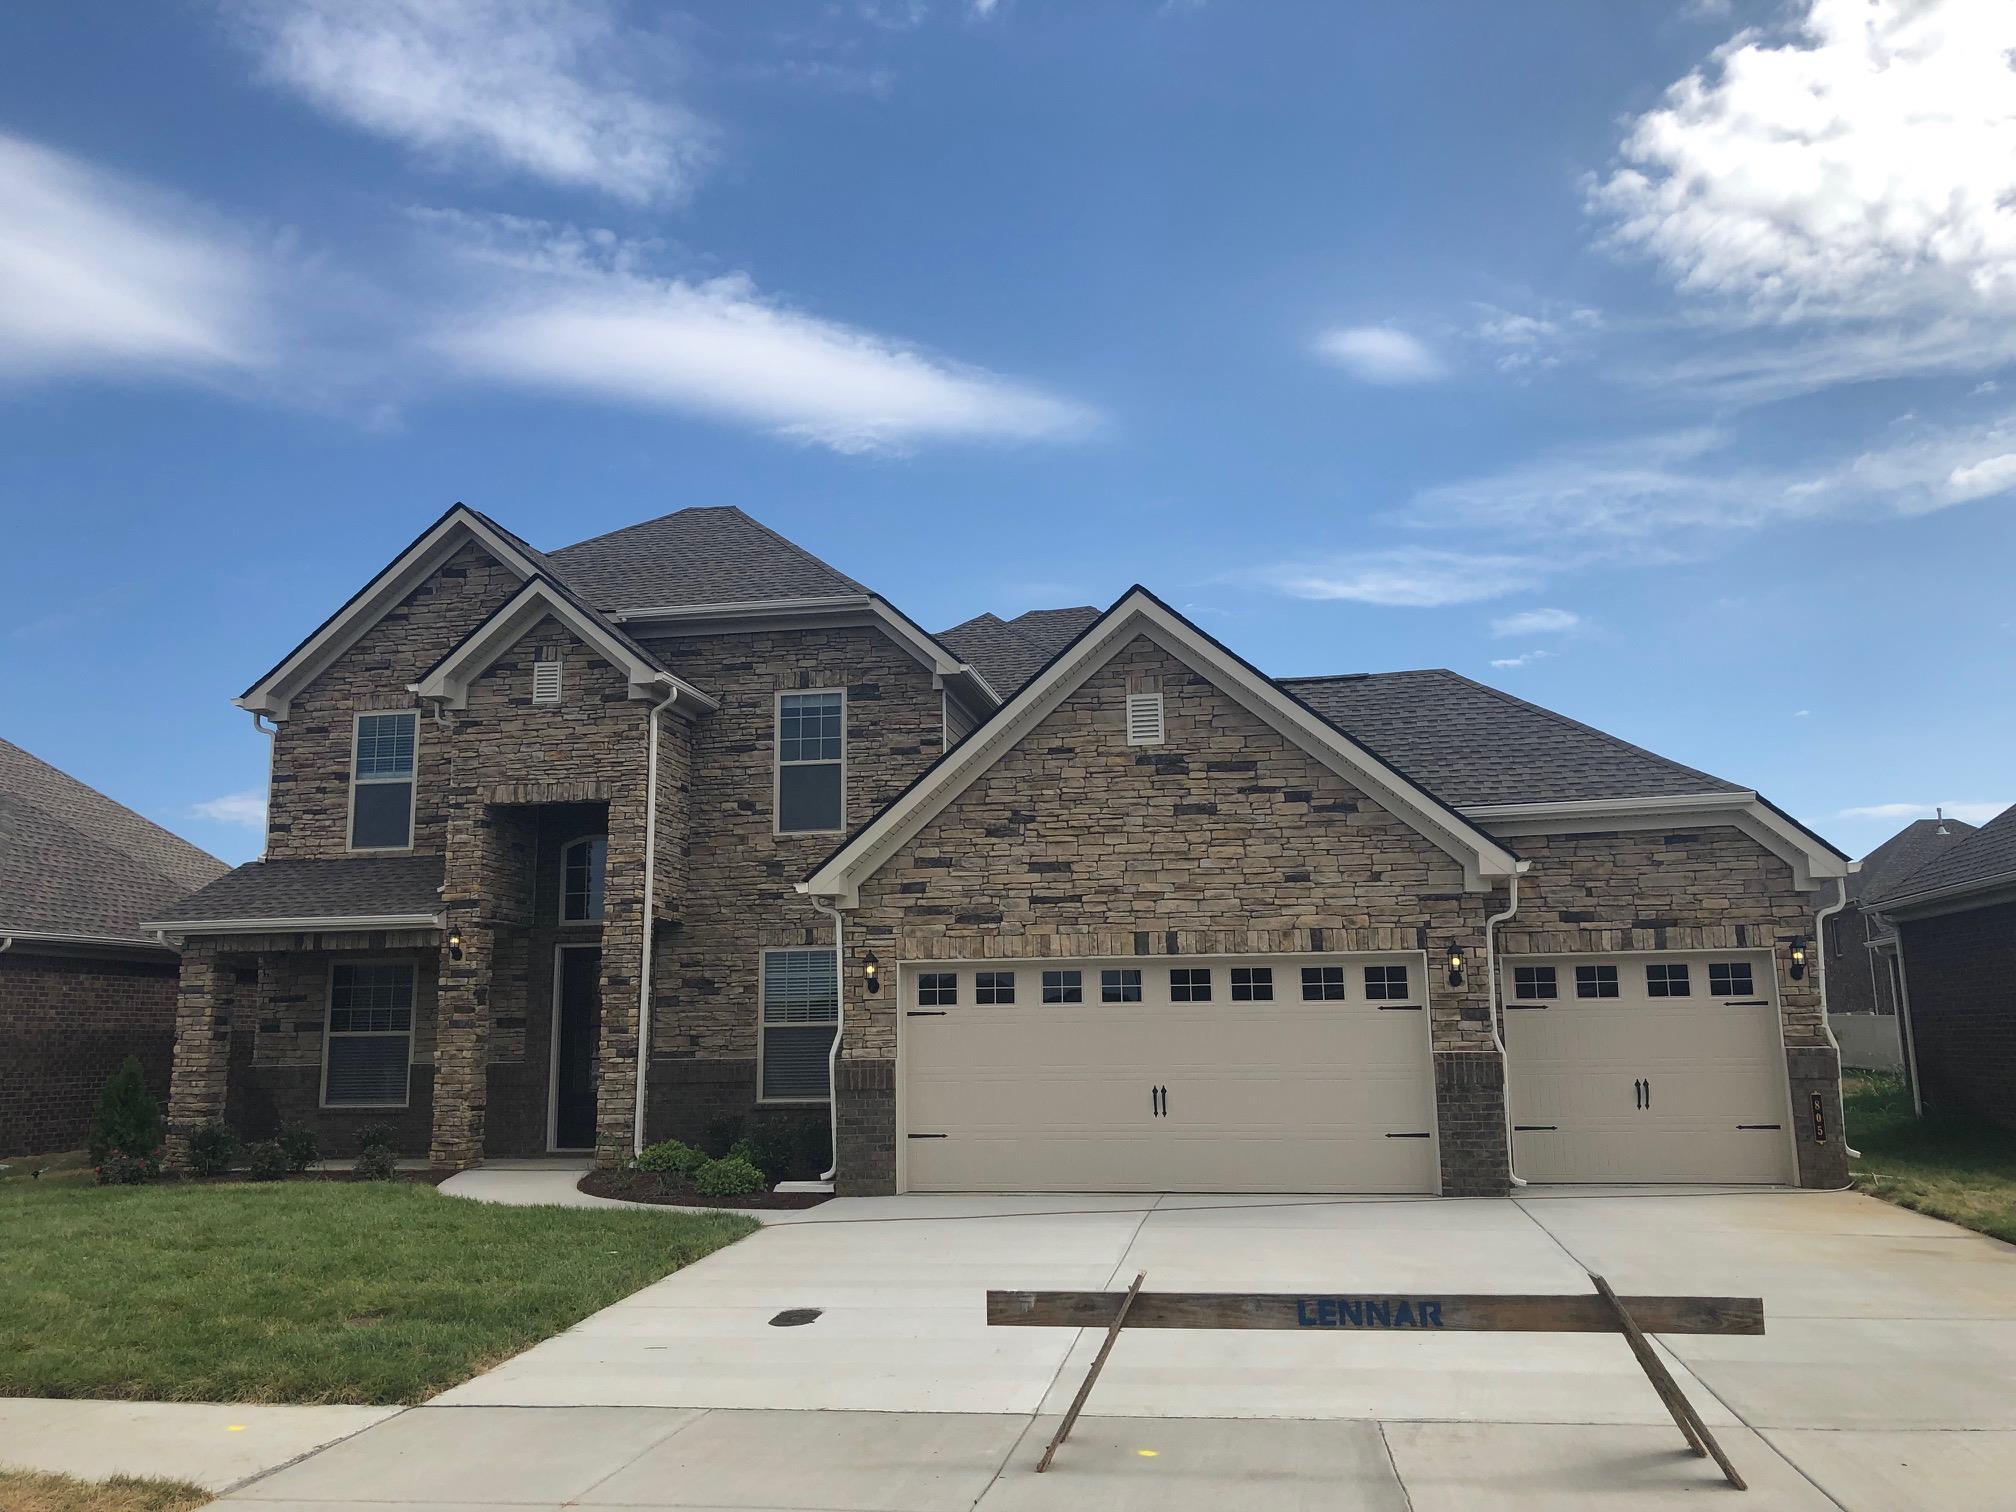 805 Kirk Lane Lot 188P, Murfreesboro, TN 37128 - Murfreesboro, TN real estate listing